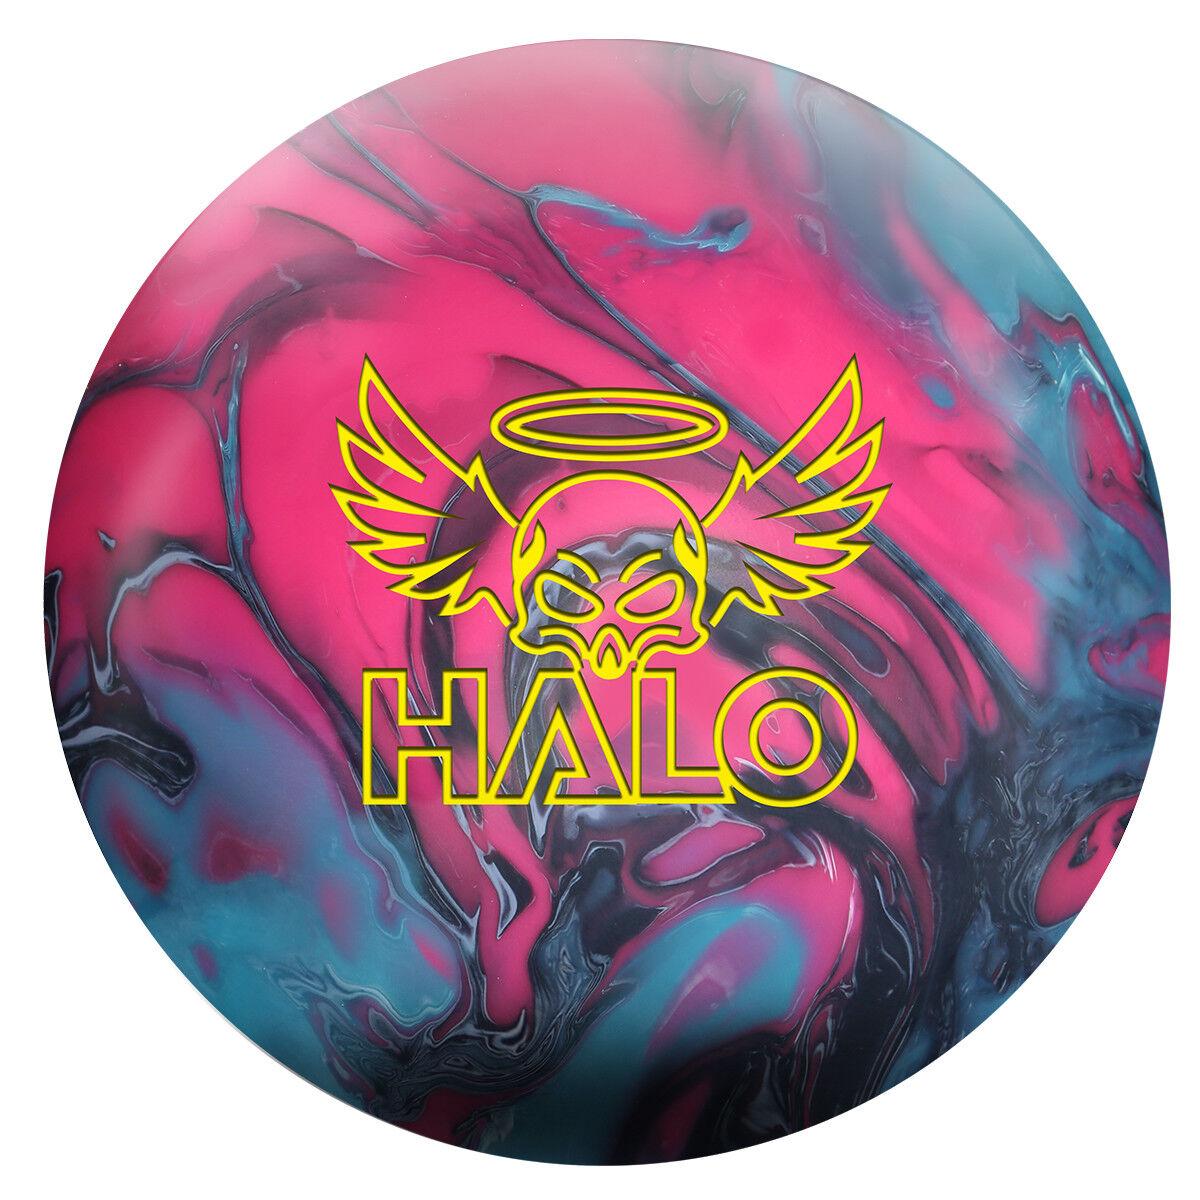 13lb redo Grip Halo Bowling Ball